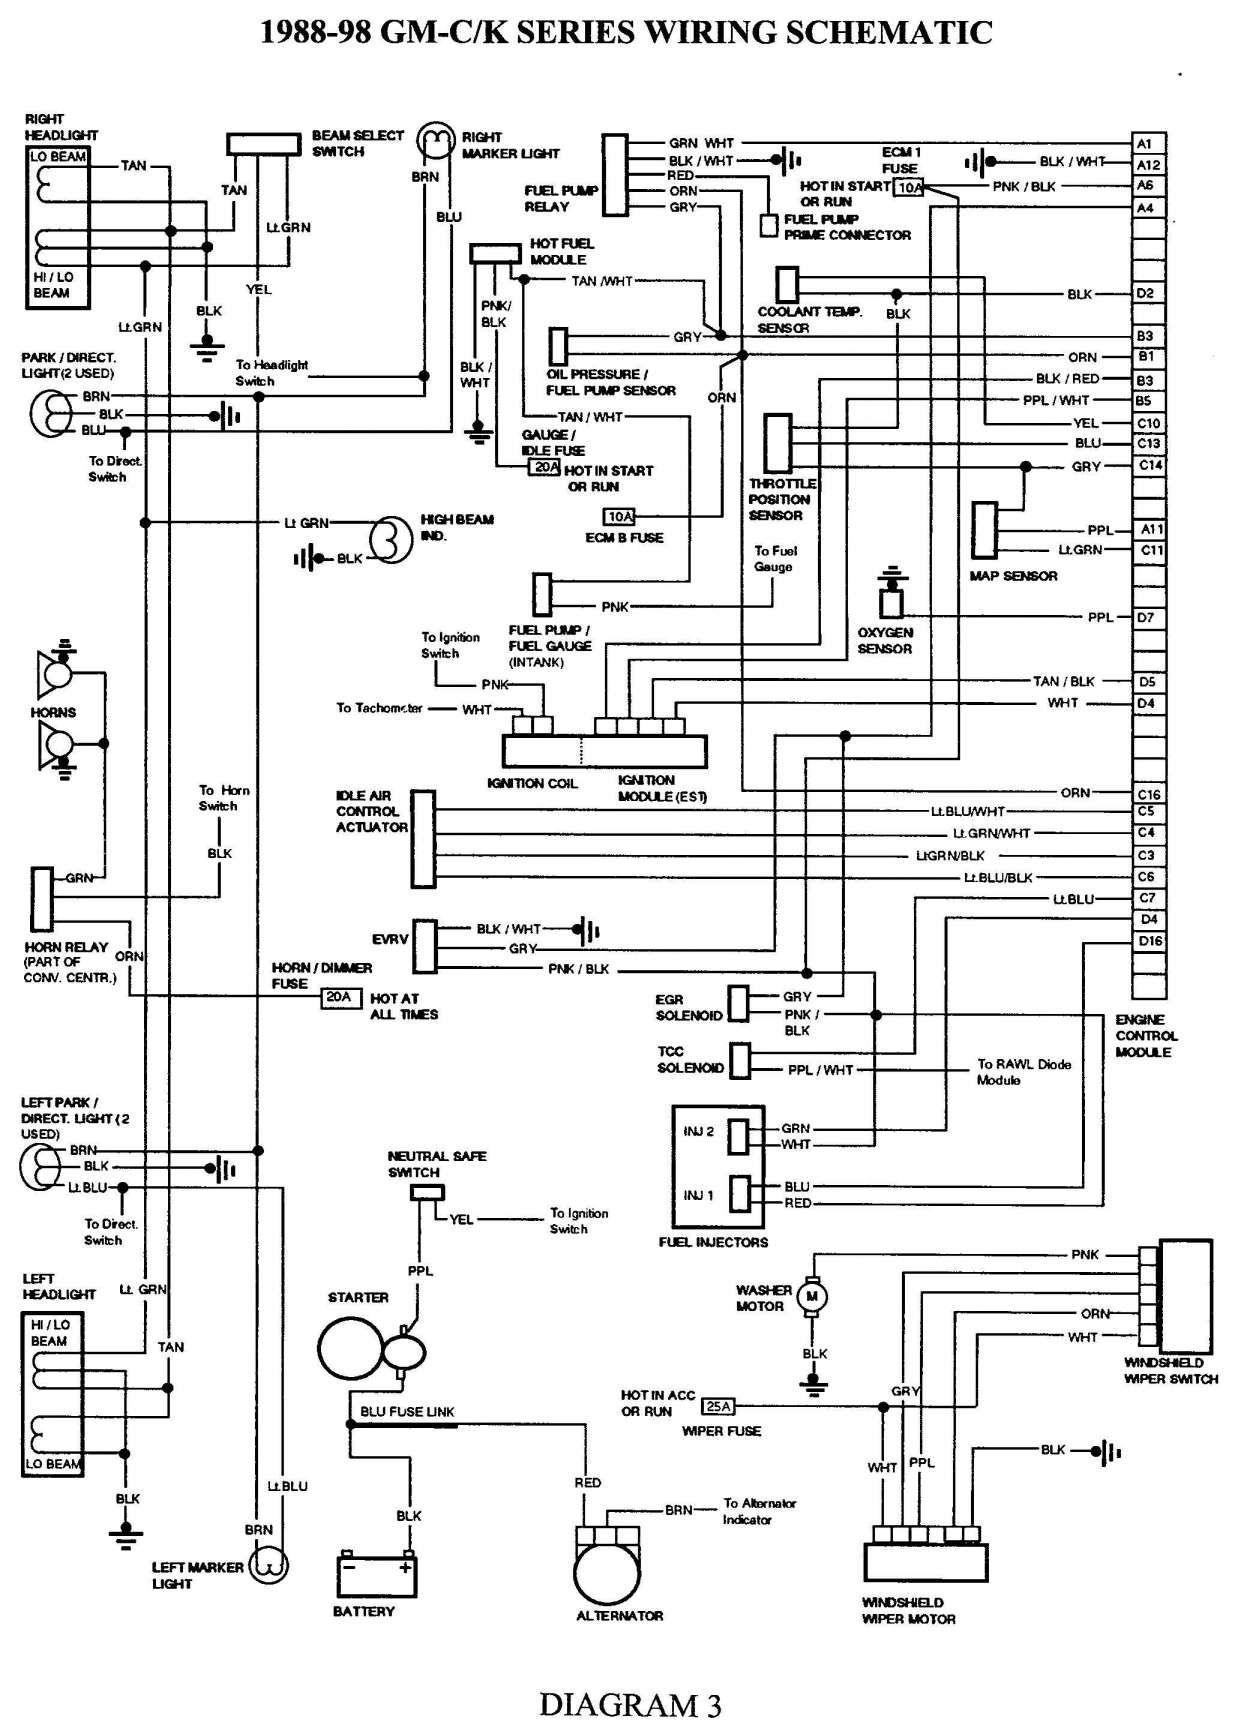 1994 Gmc Yukon Wiring Diagram - Wiring Diagrams Schema prior -  prior.wheeladvisor.it